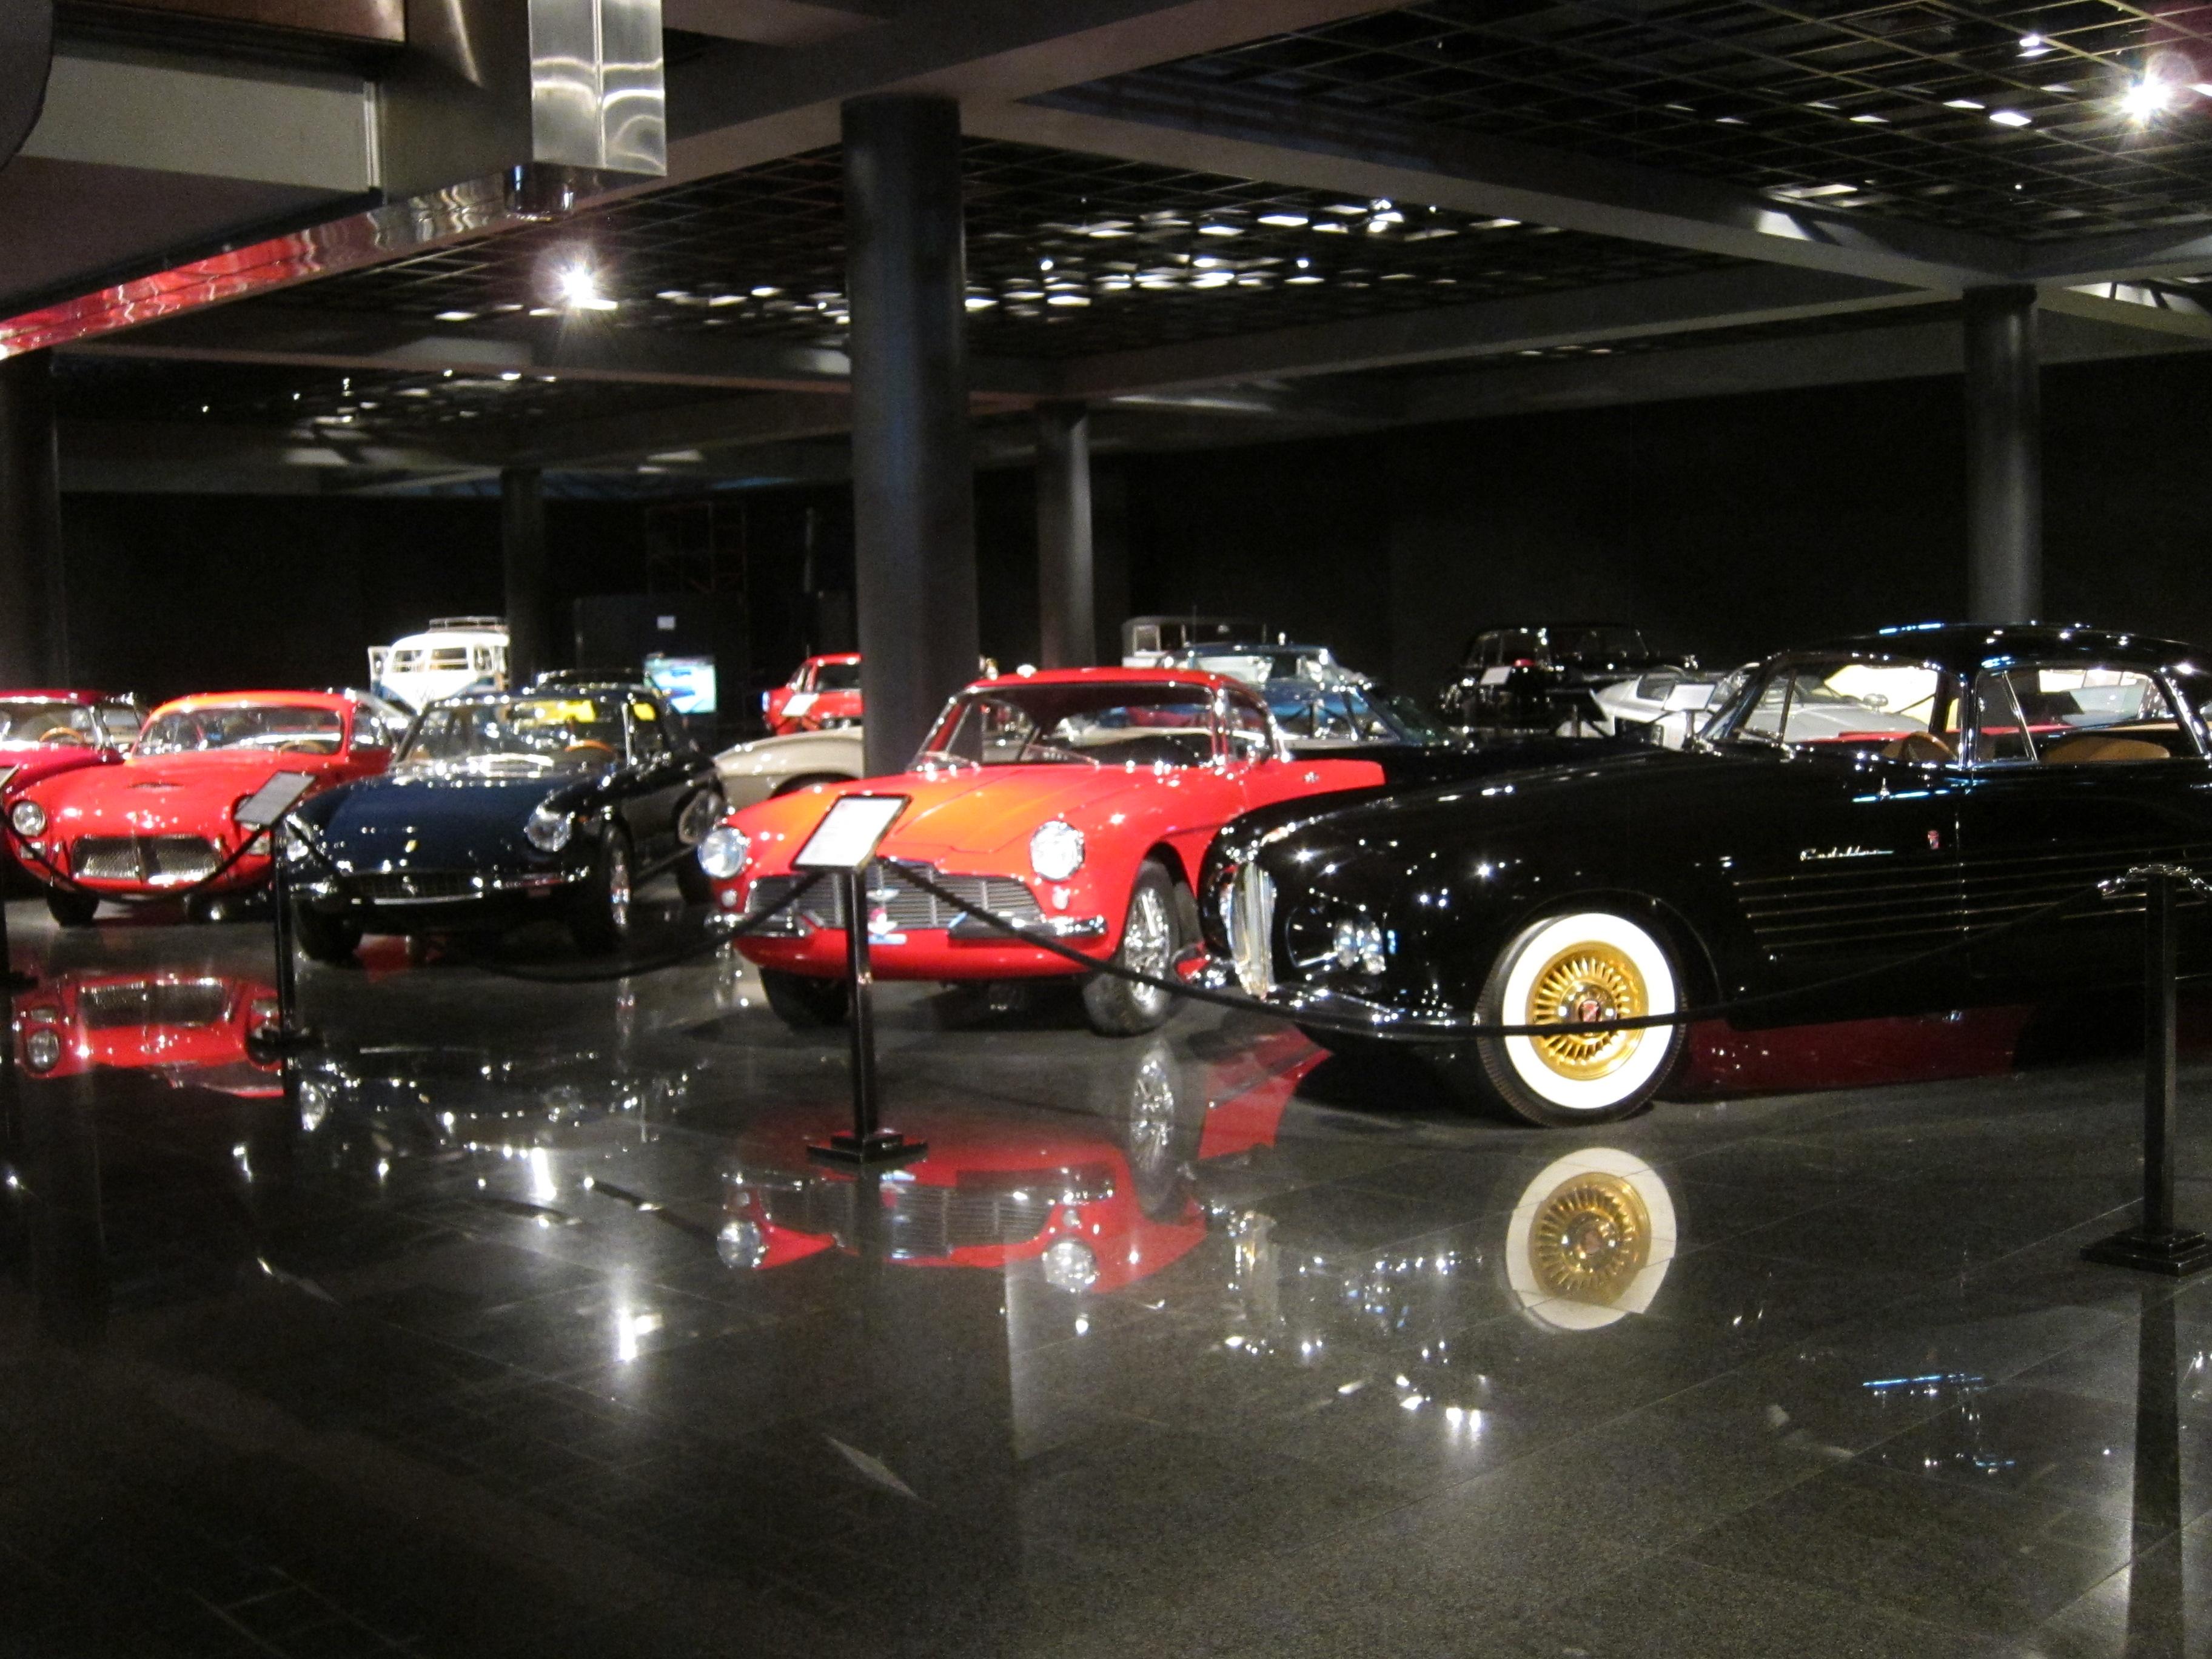 Blackhawk_Automobile_Museum_-_Flickr_-_jaycross